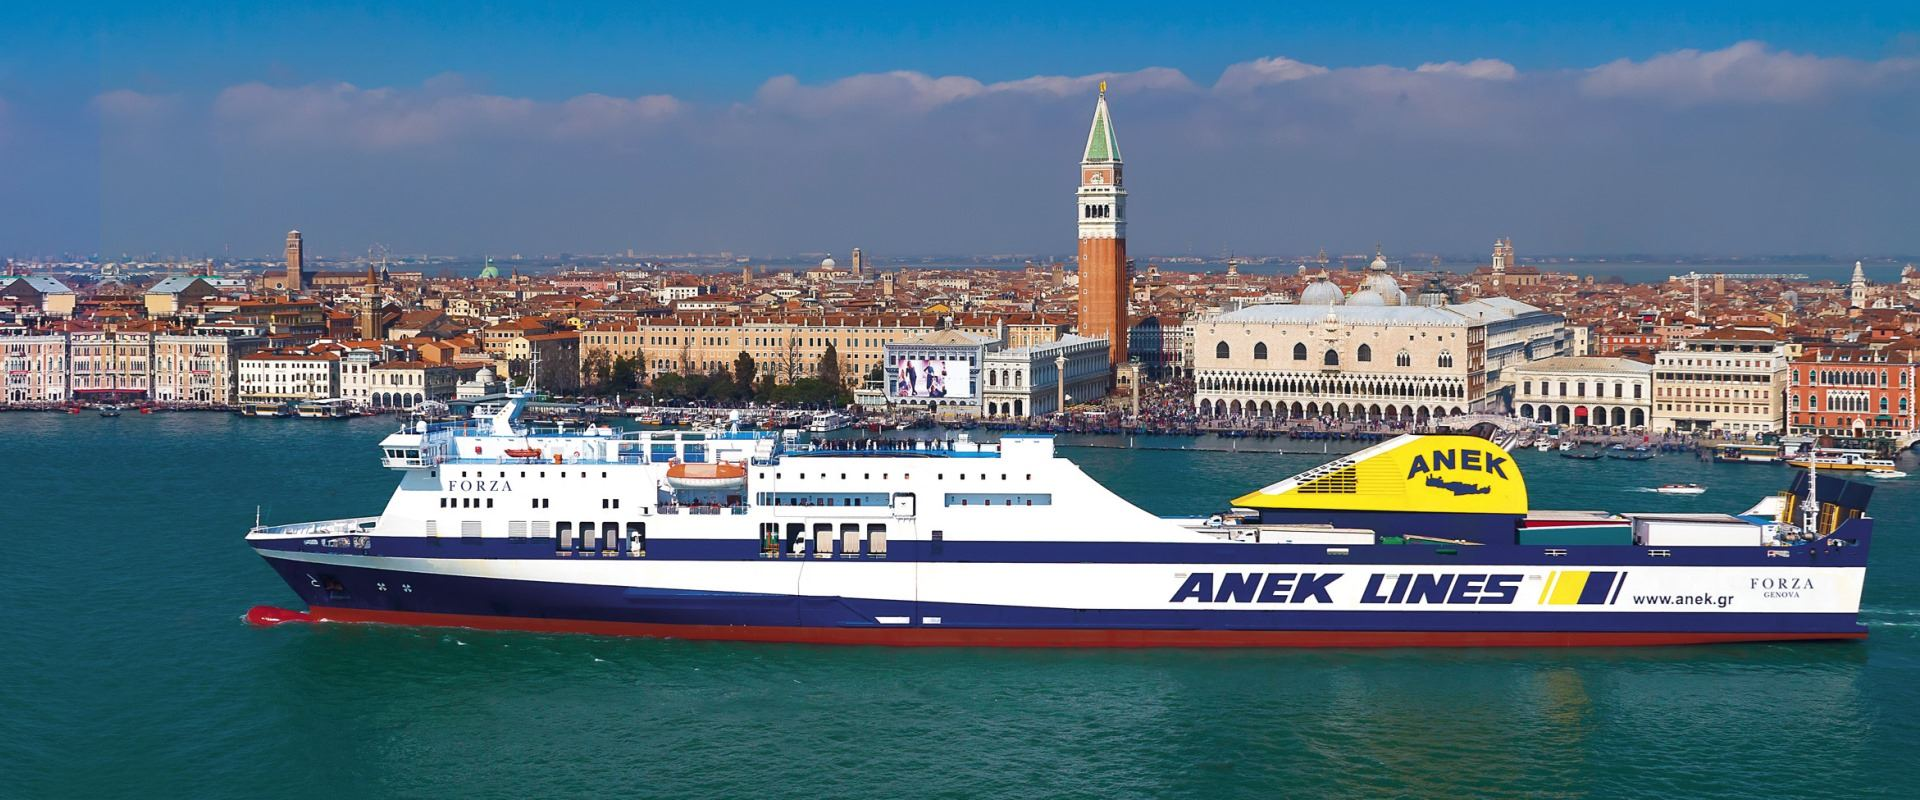 Traghetti Anek